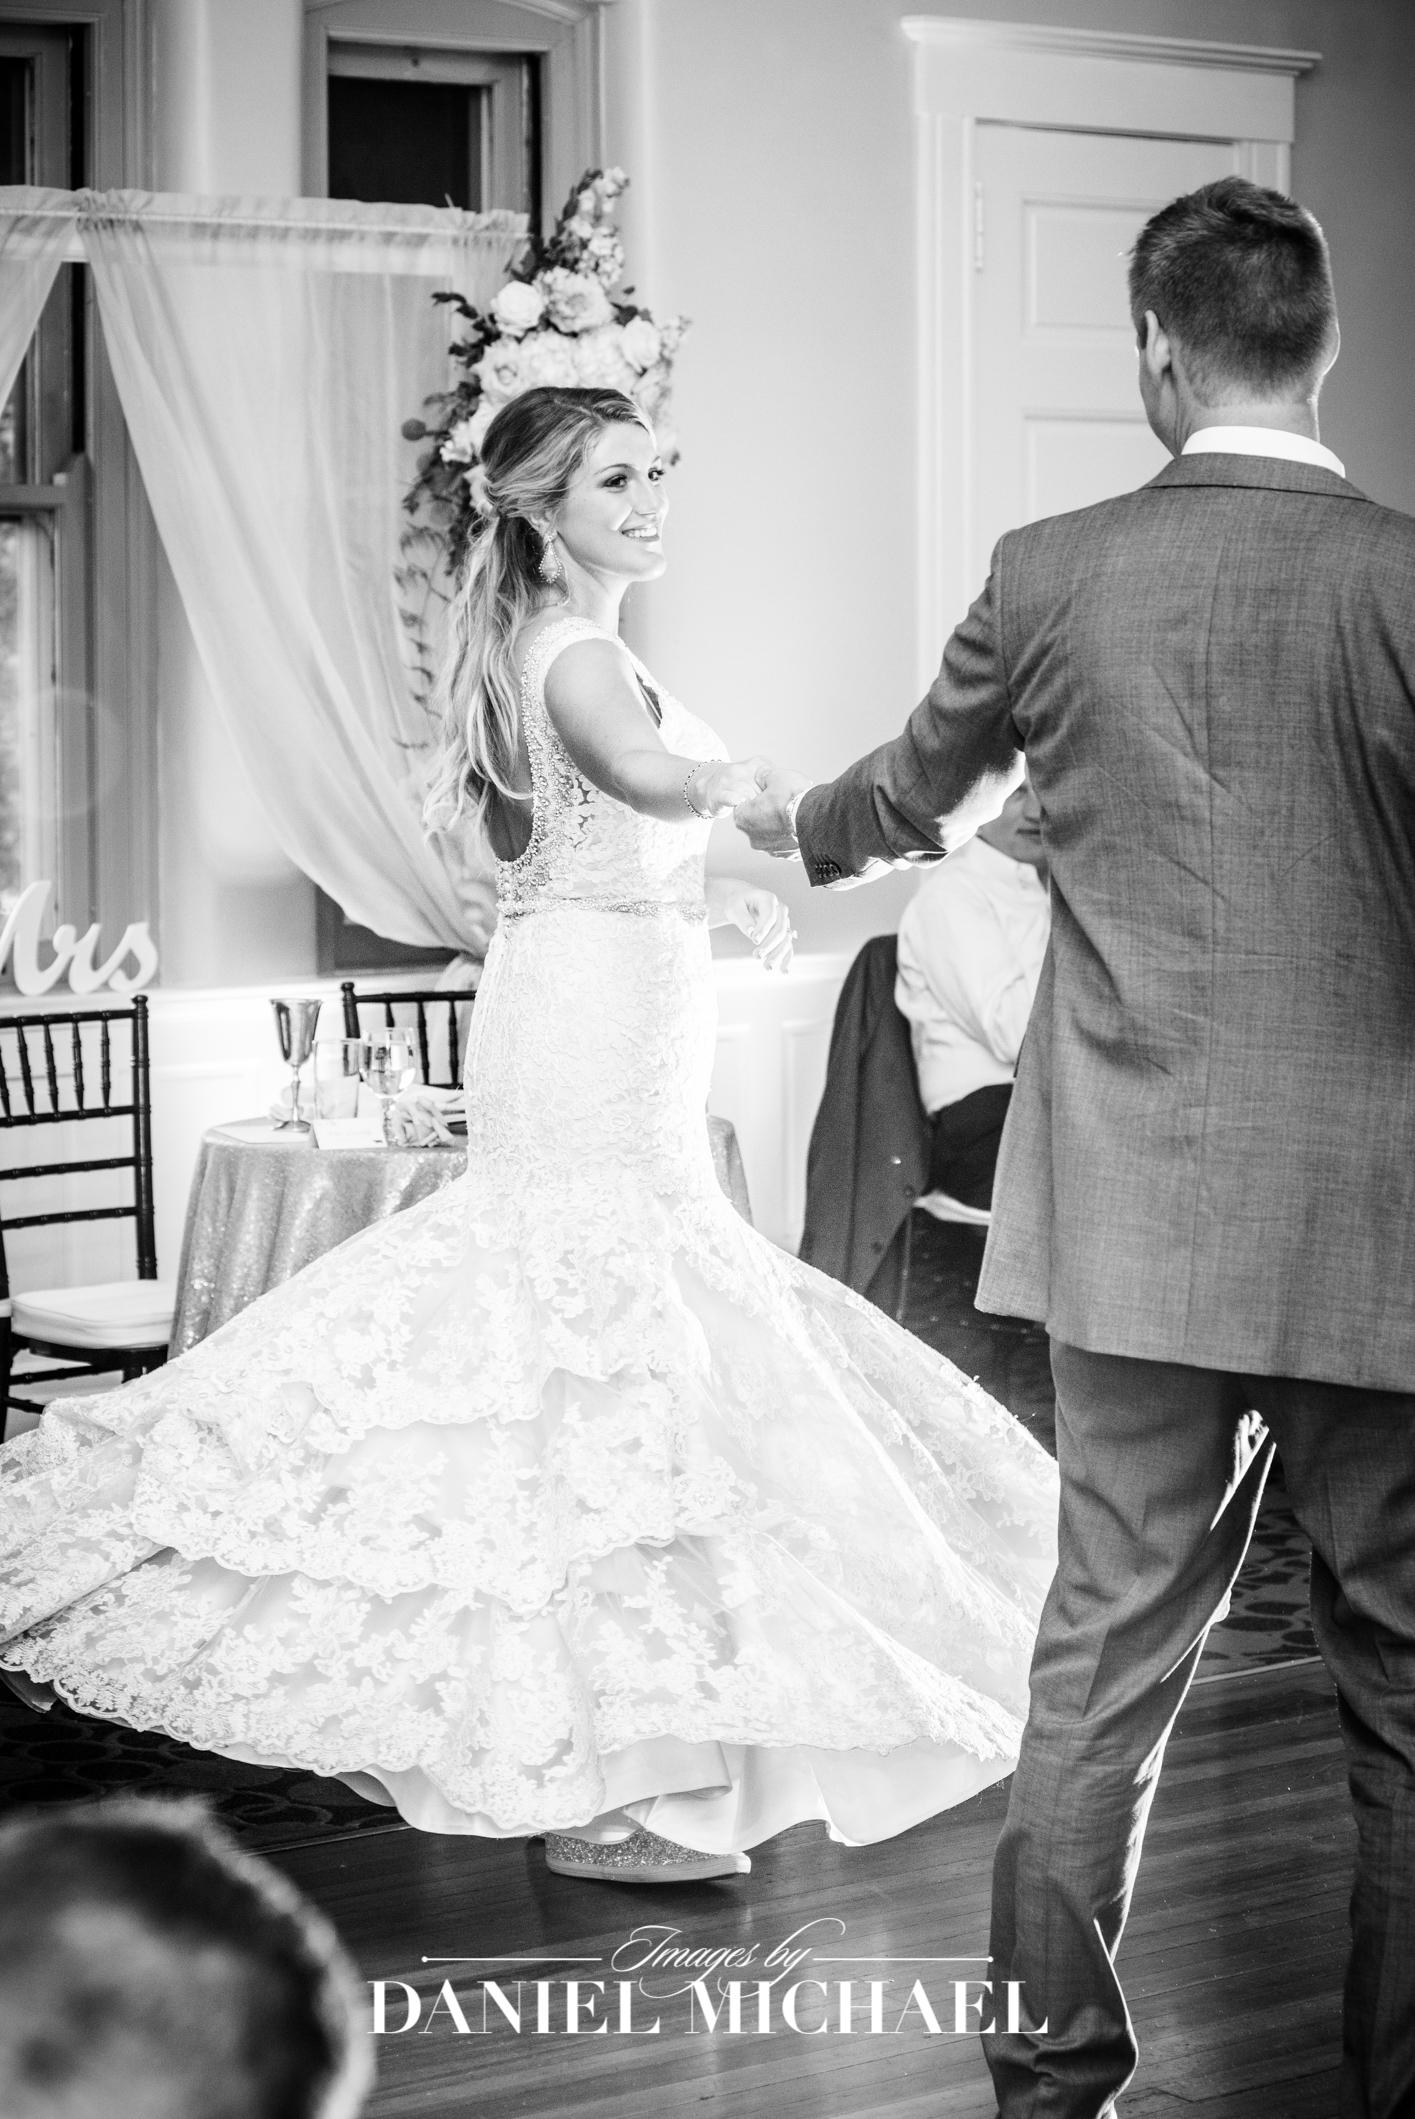 Carnegie Hall Venue Wedding Ceremony Photographer